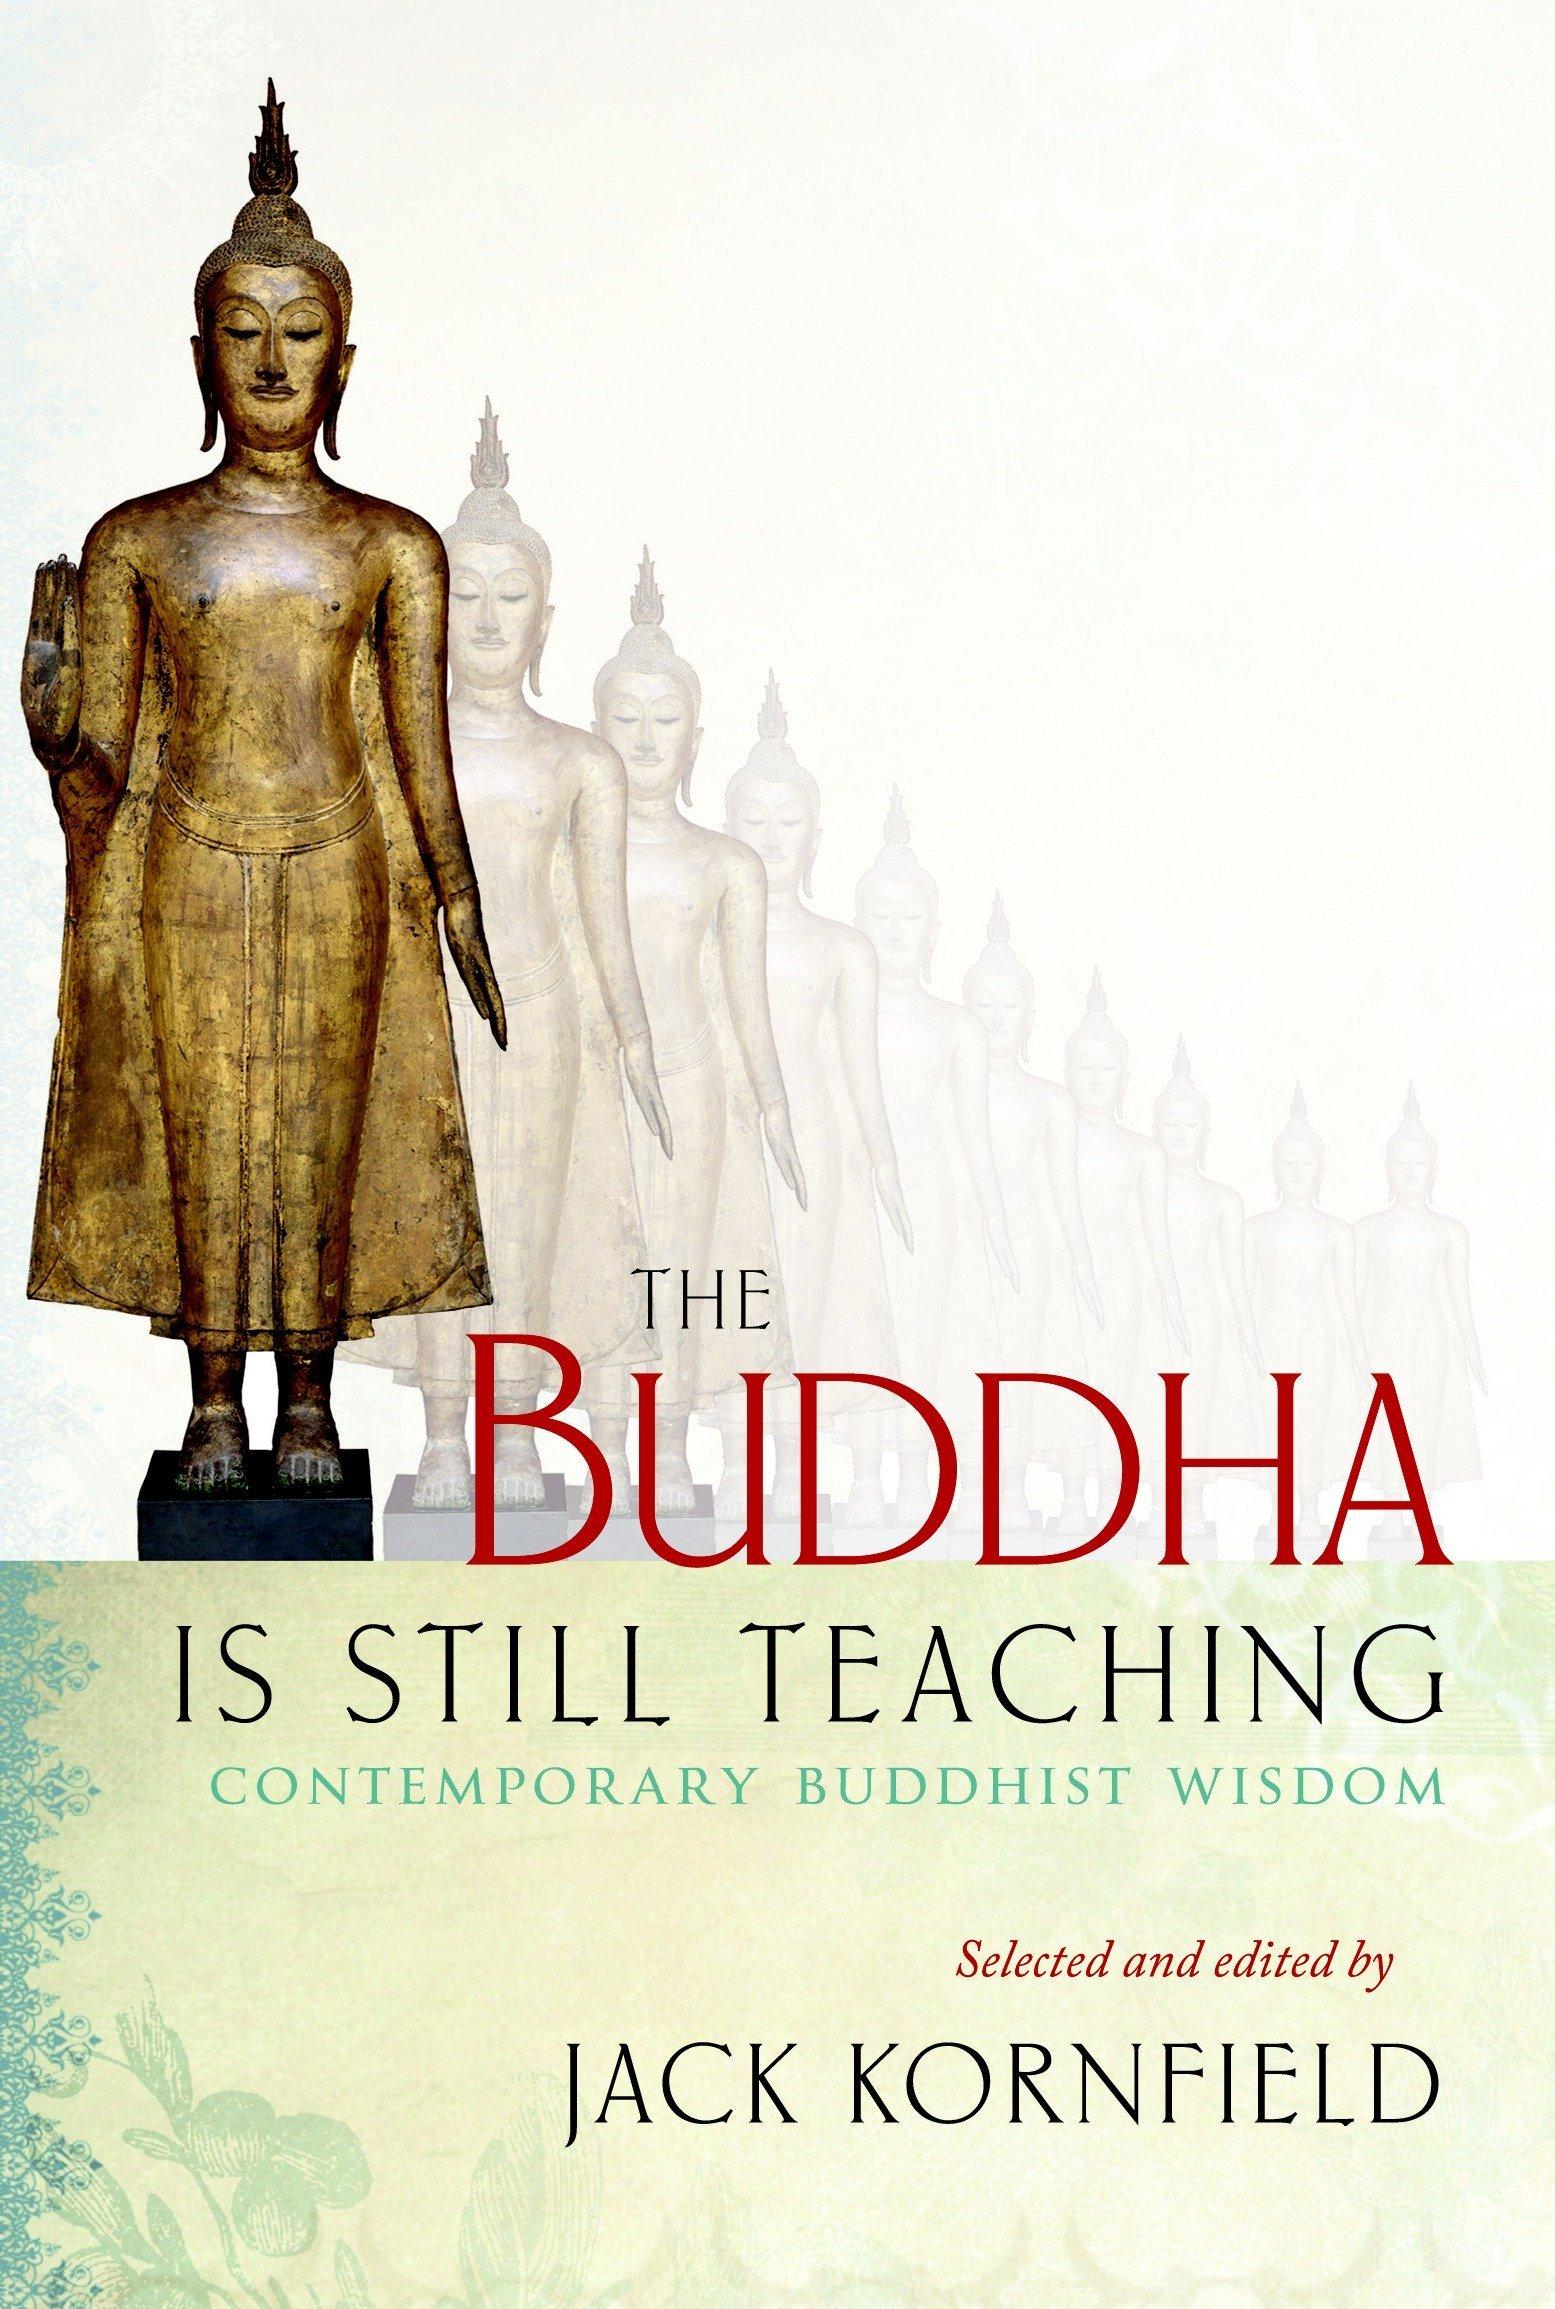 The Buddha Is Still Teaching: Contemporary Buddhist Wisdom por Jack Kornfield